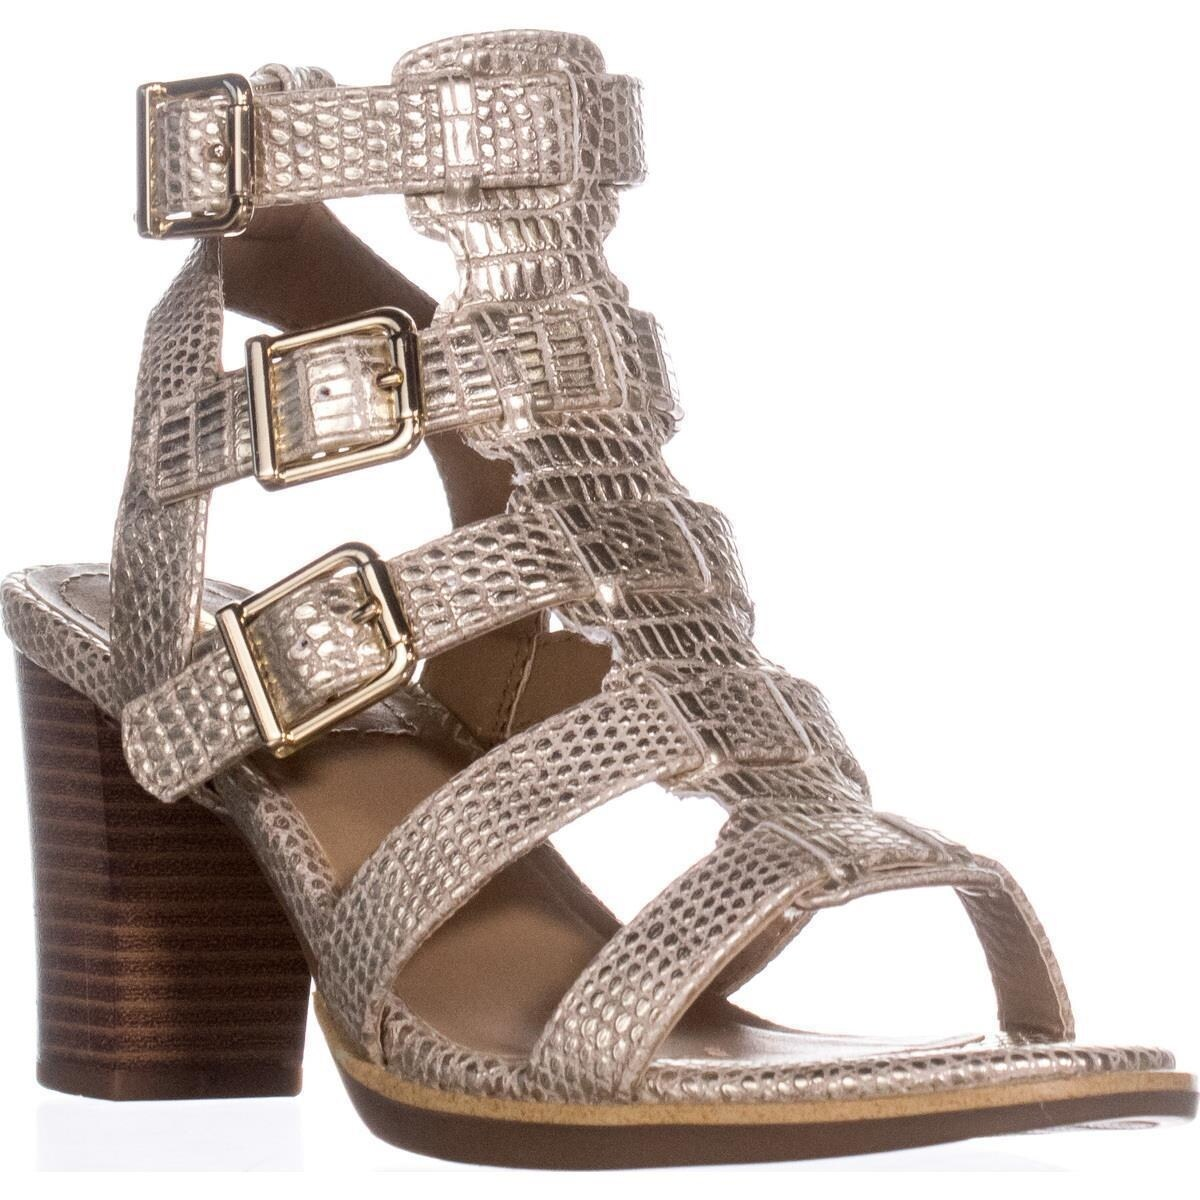 754b0d5b6e69 Buy Gladiator Women s Sandals Online at Overstock